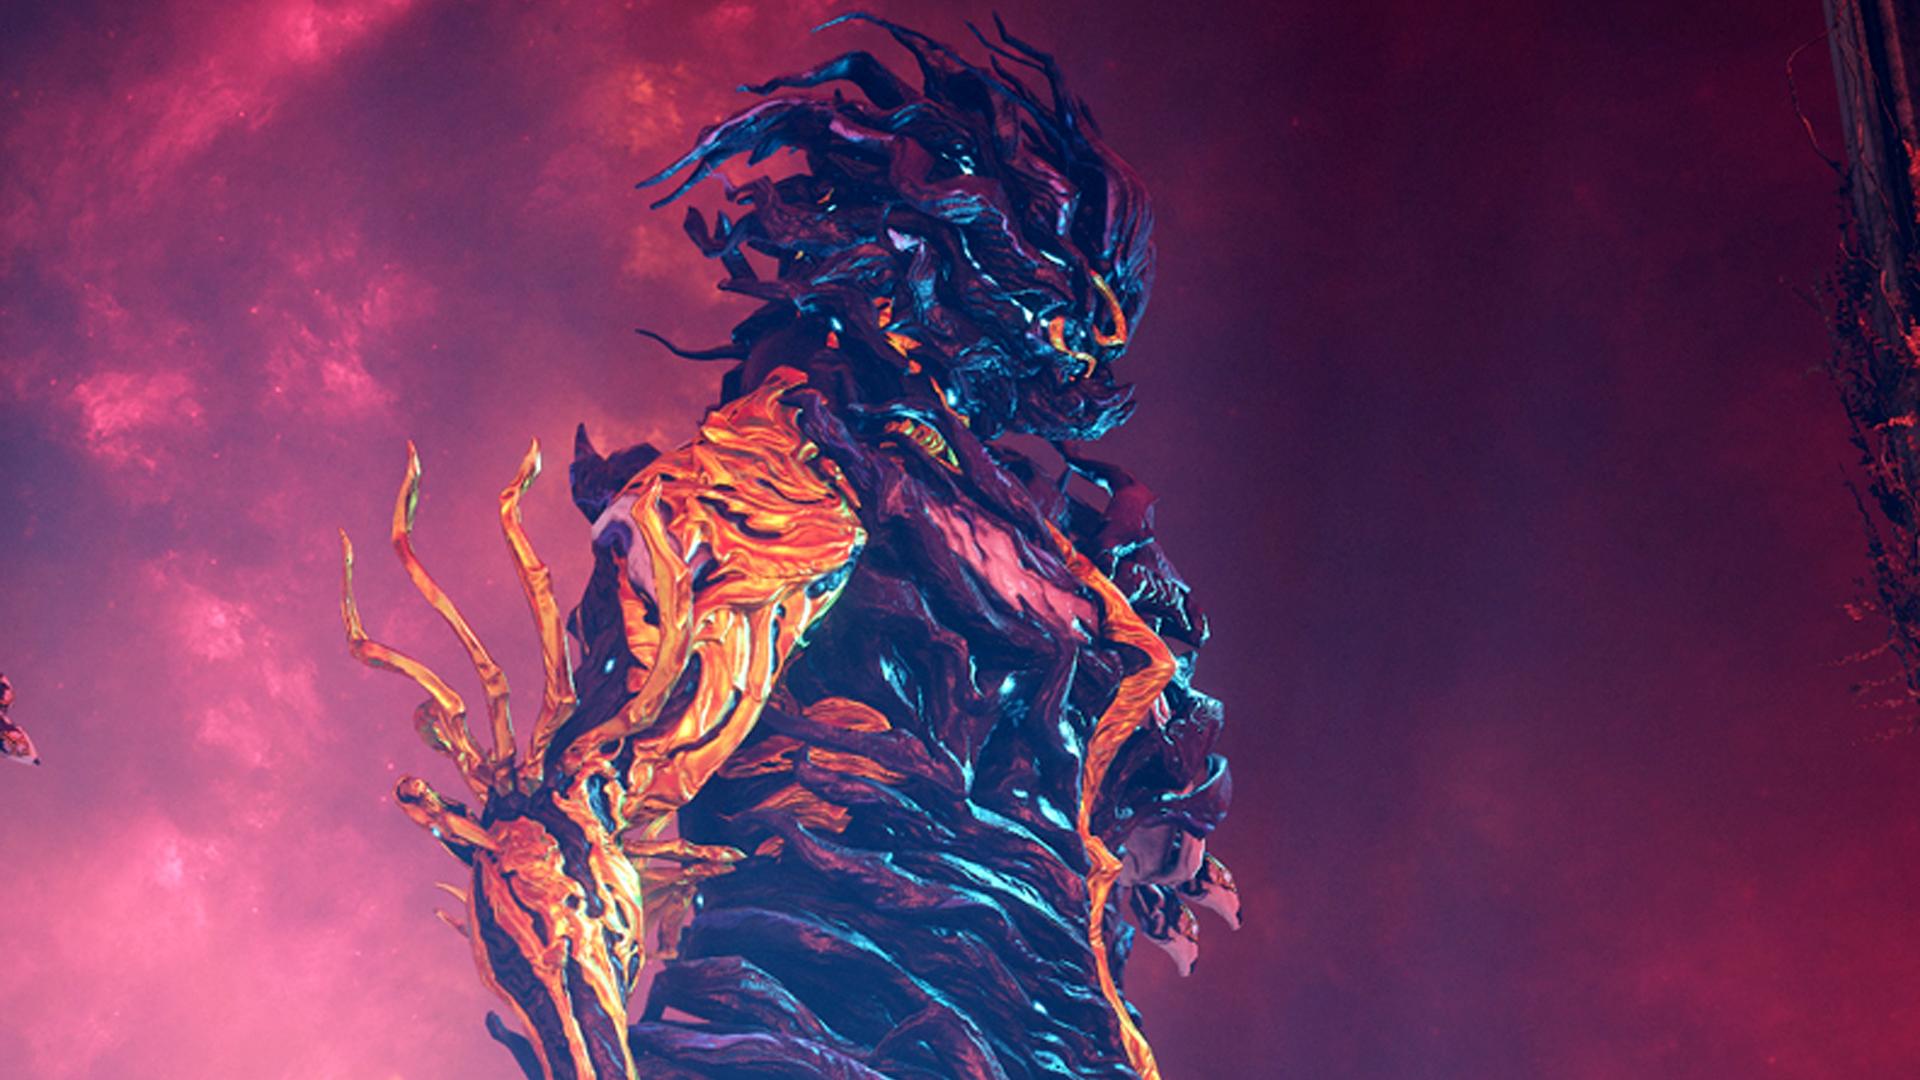 Nidus Prime and half-Sentient Caliban are Warframe's next 'frames